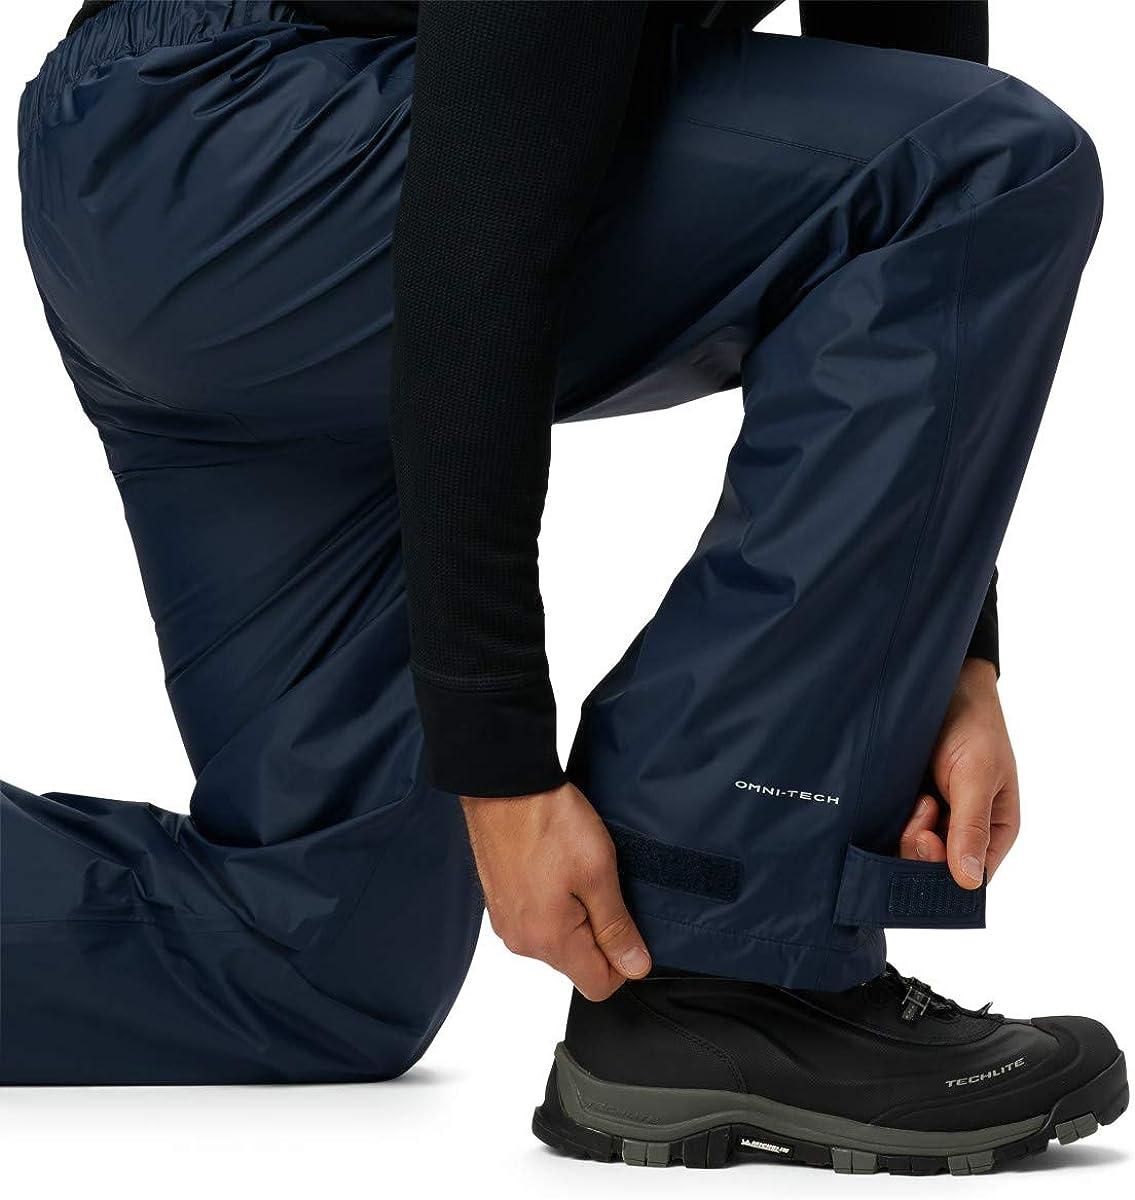 Collegiate Navy Columbia Big and Tall Mens Rebel Roamer Rain Pant Waterproof /& Breathable 4X x 32 Inseam